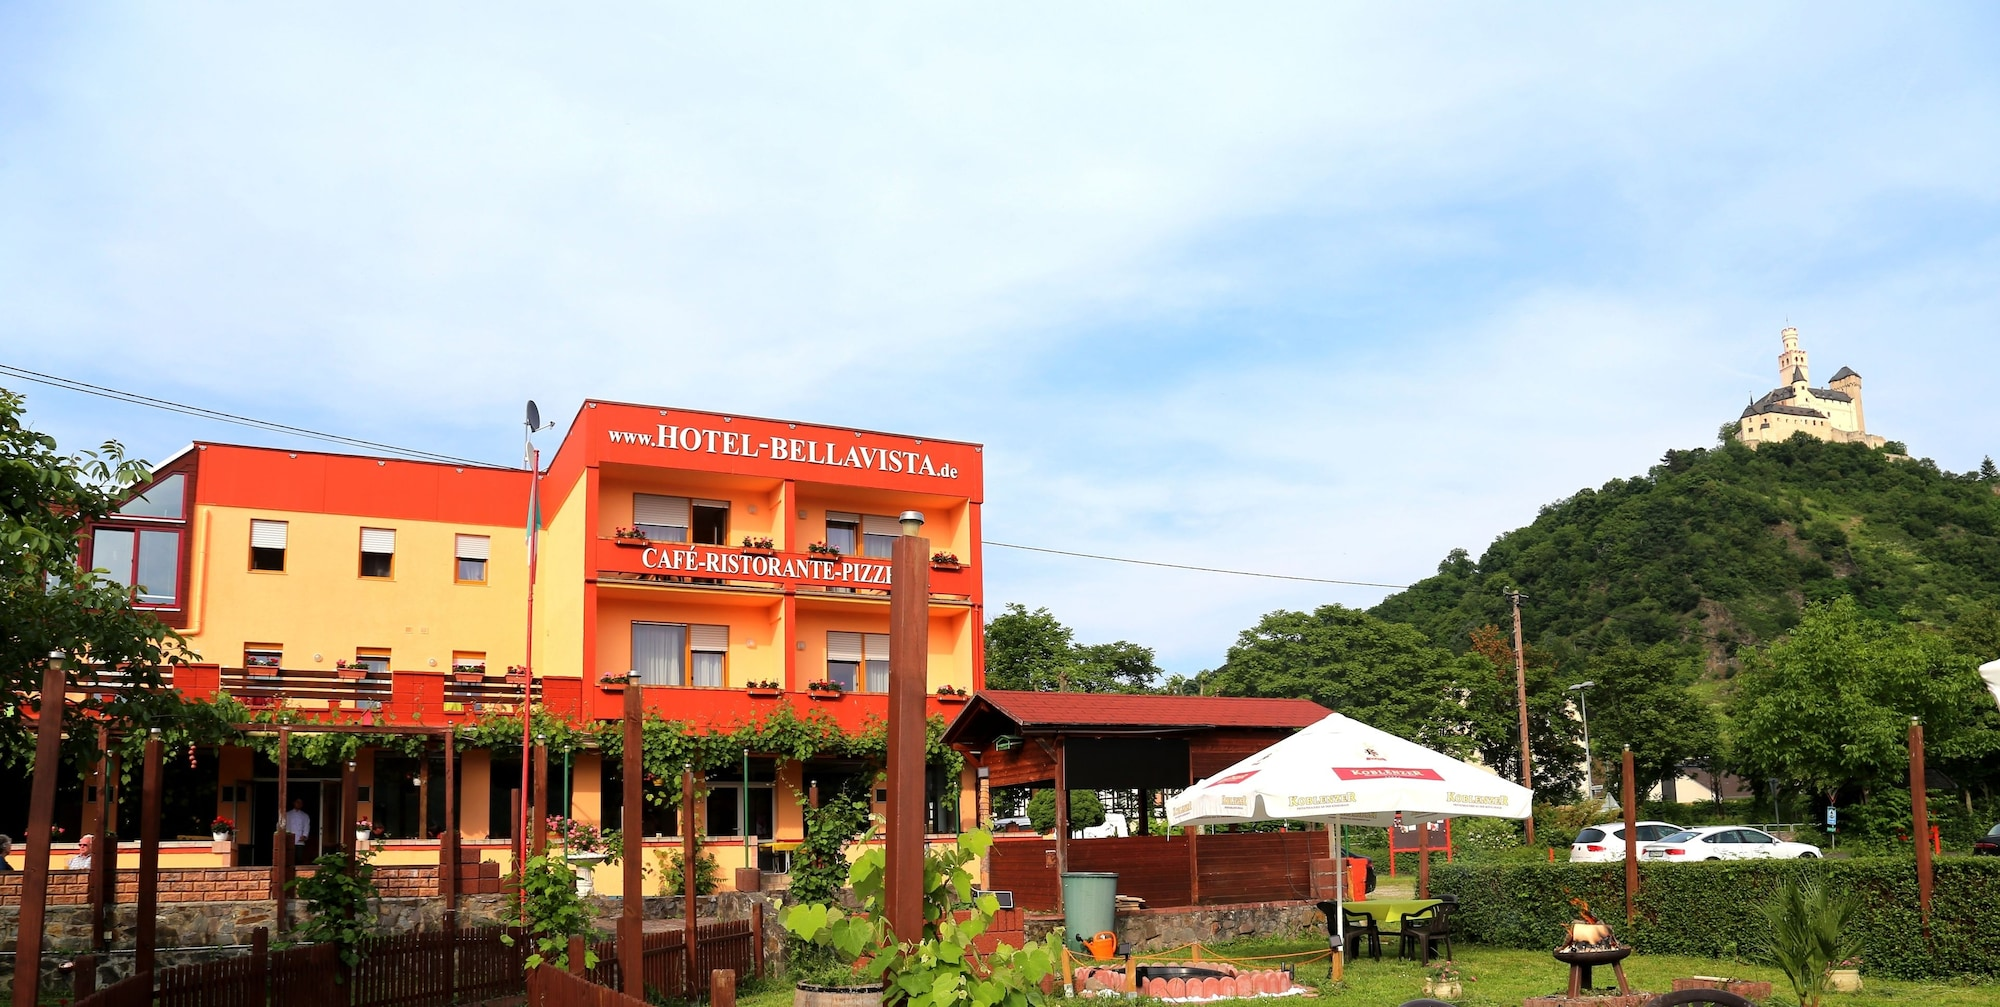 Hotel Bellavista, Rhein-Lahn-Kreis